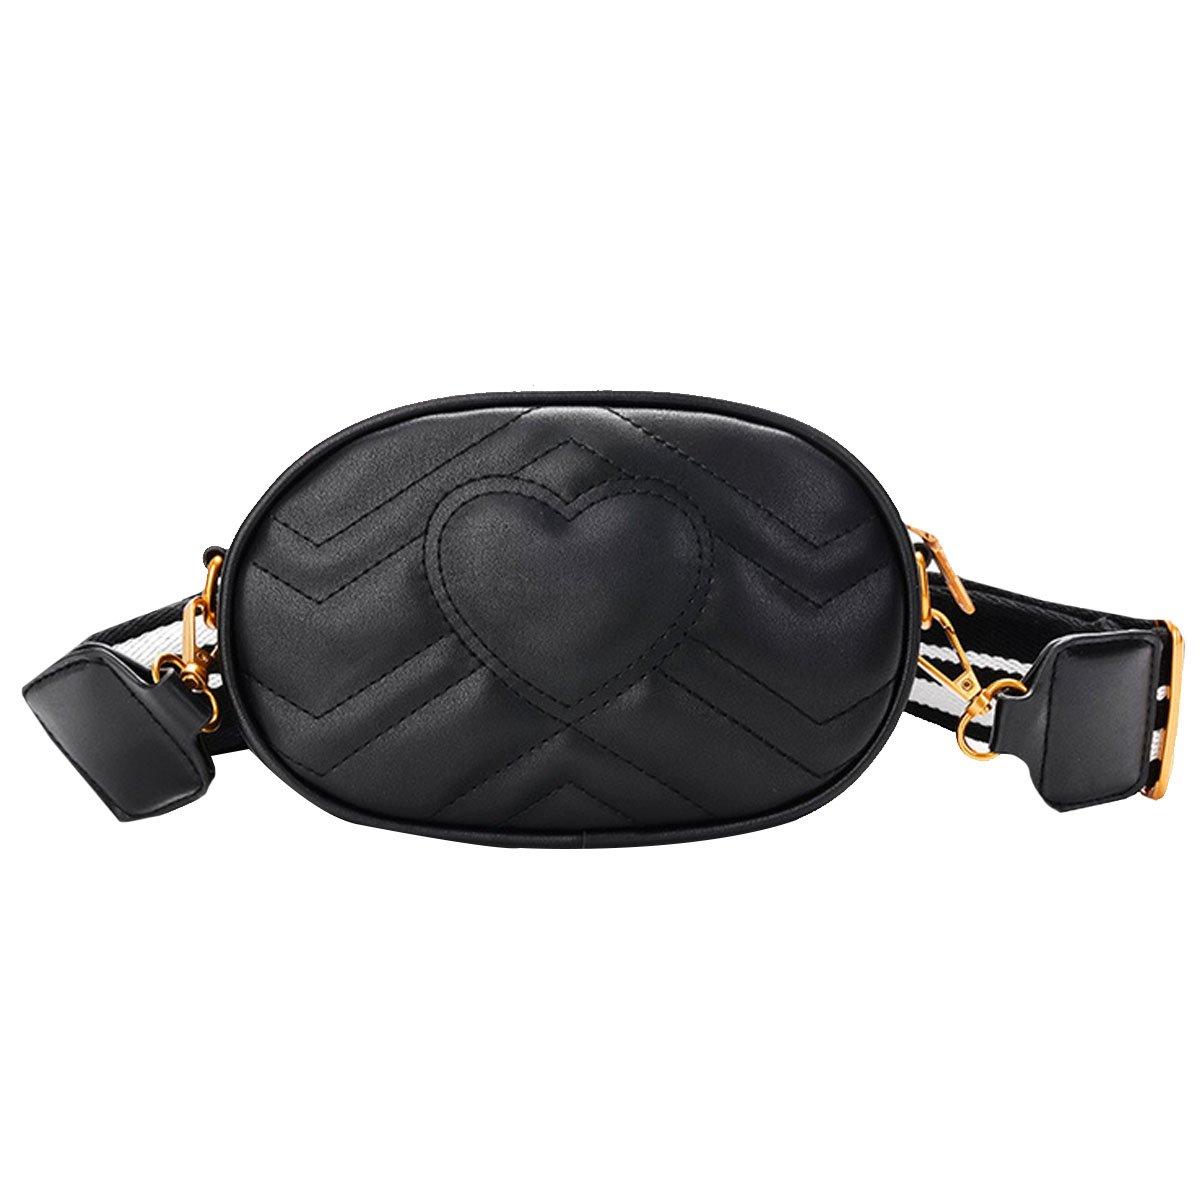 Mily Fashion Women Elegant PU Leather Waist Bag Love Shape Pattern Embroidery Cross Body Bag Fanny Packs